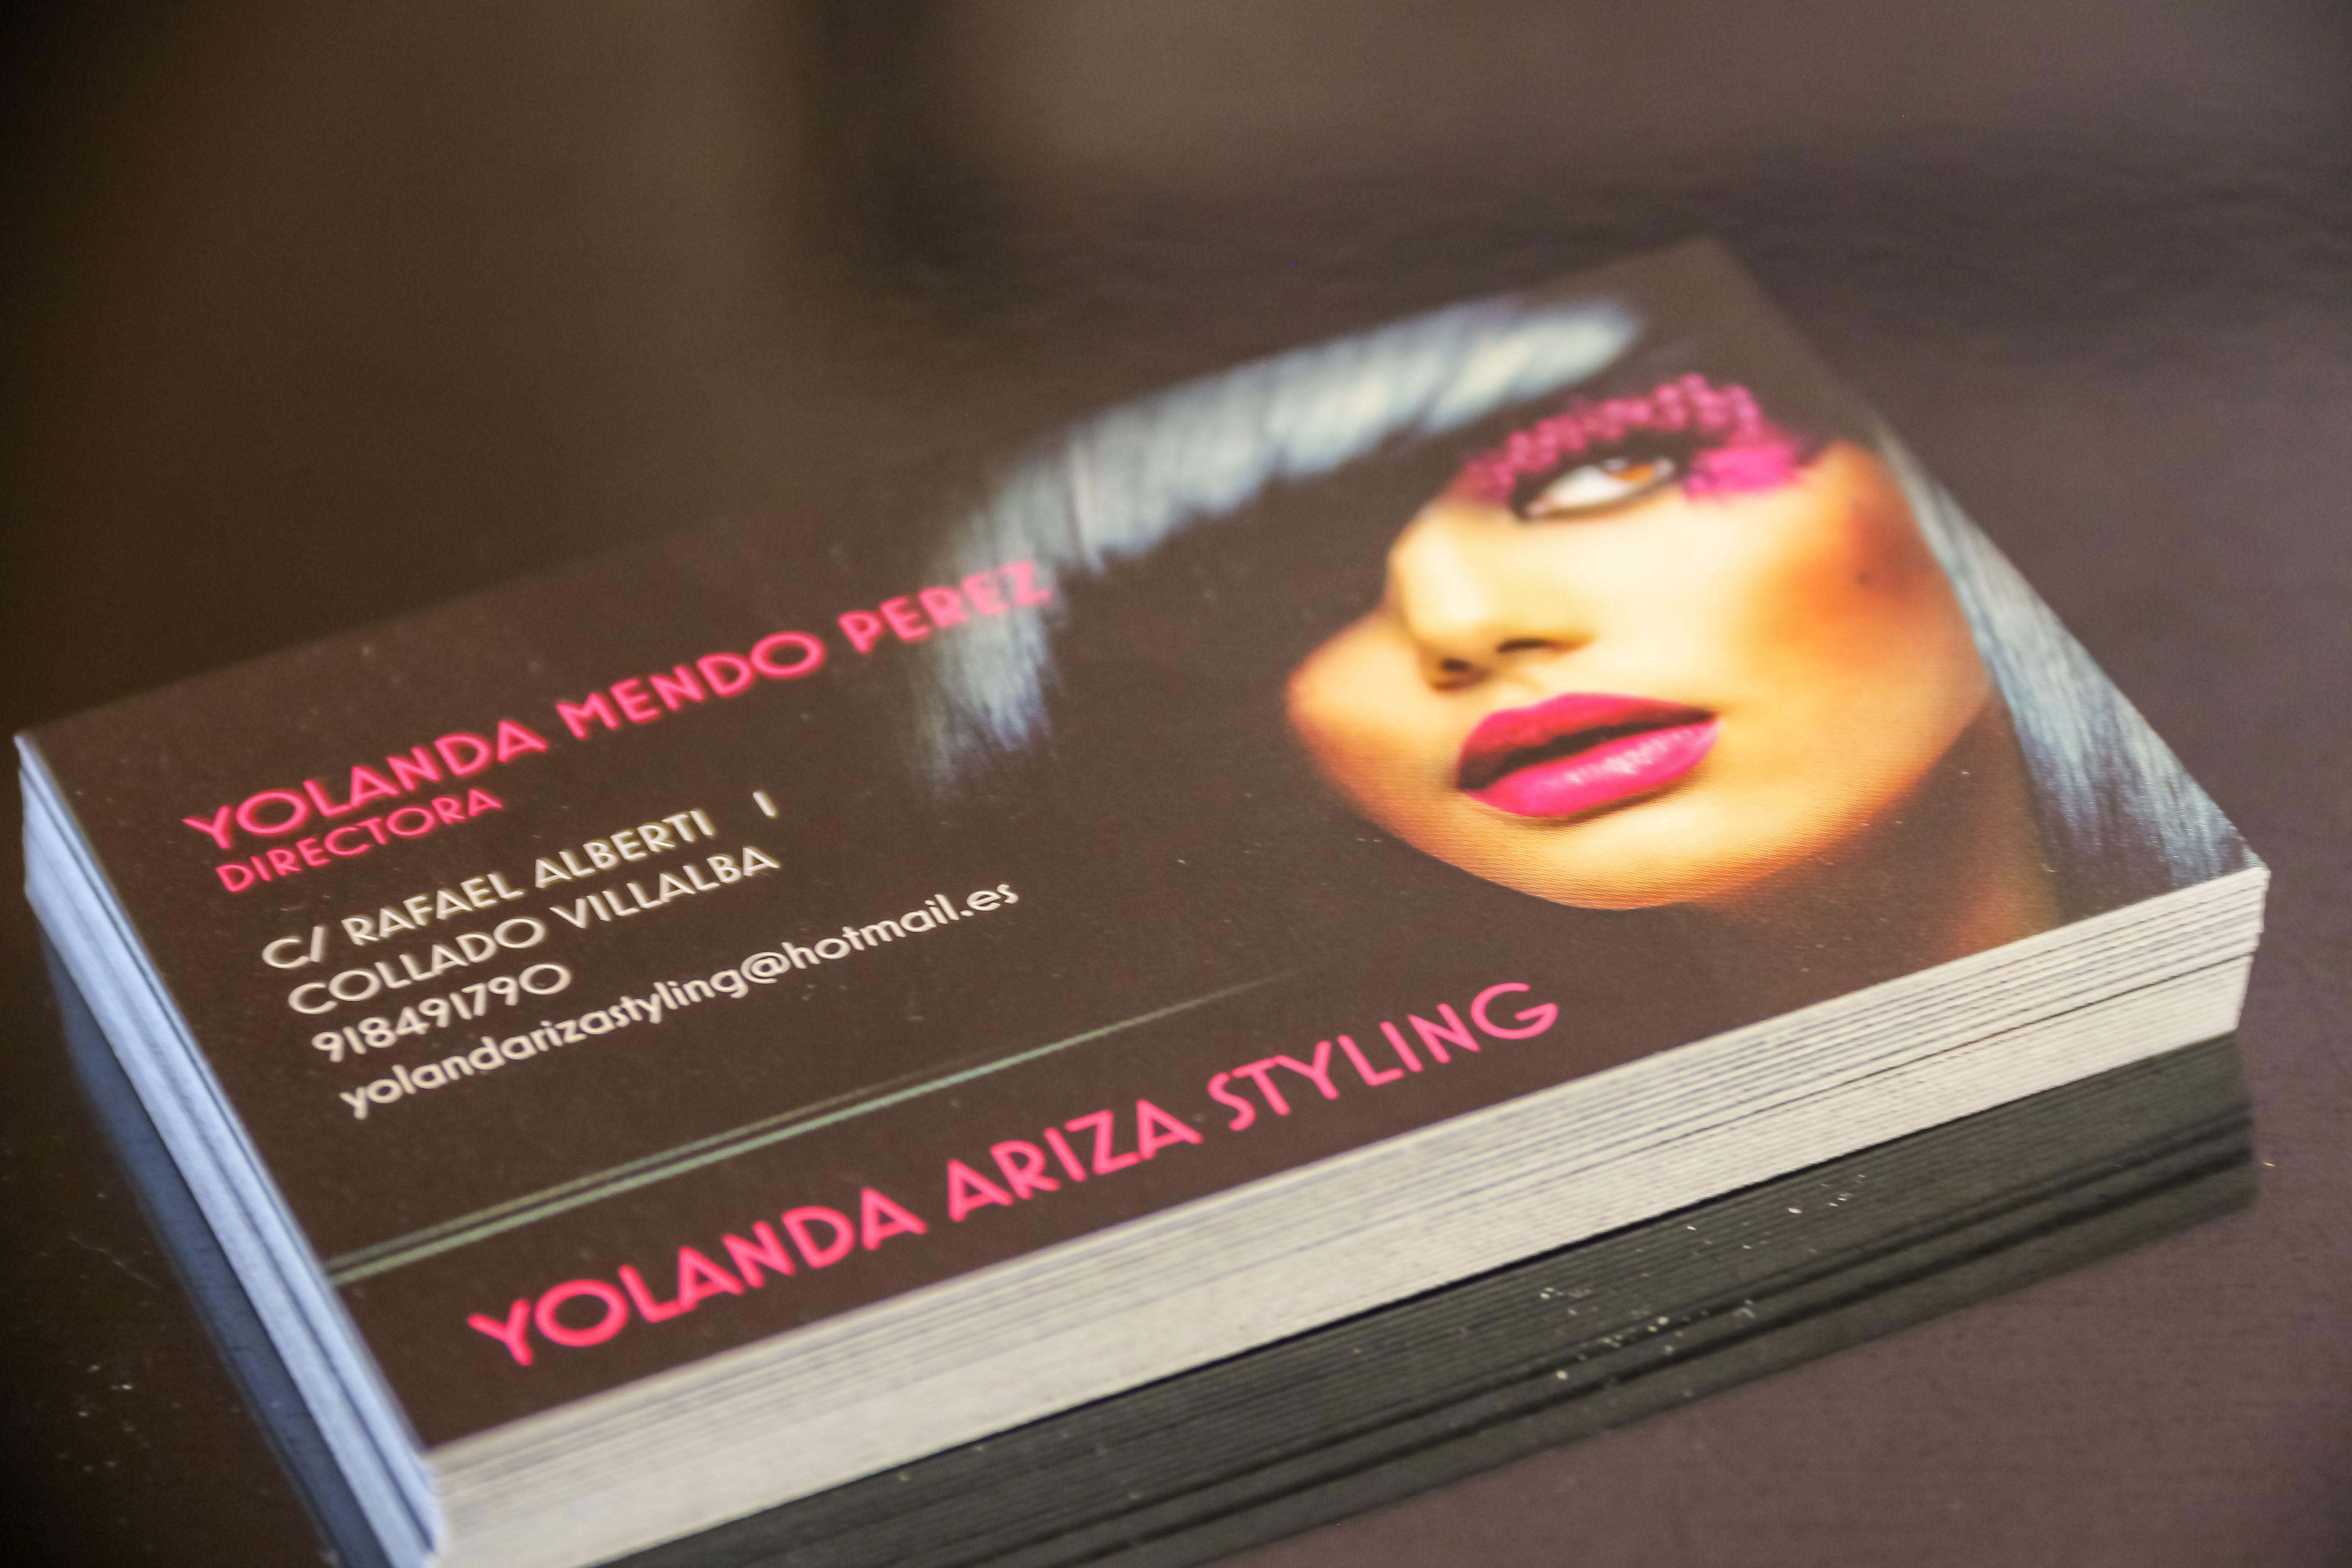 Tarjetas de visita YOLANDA ARIZA STYLING